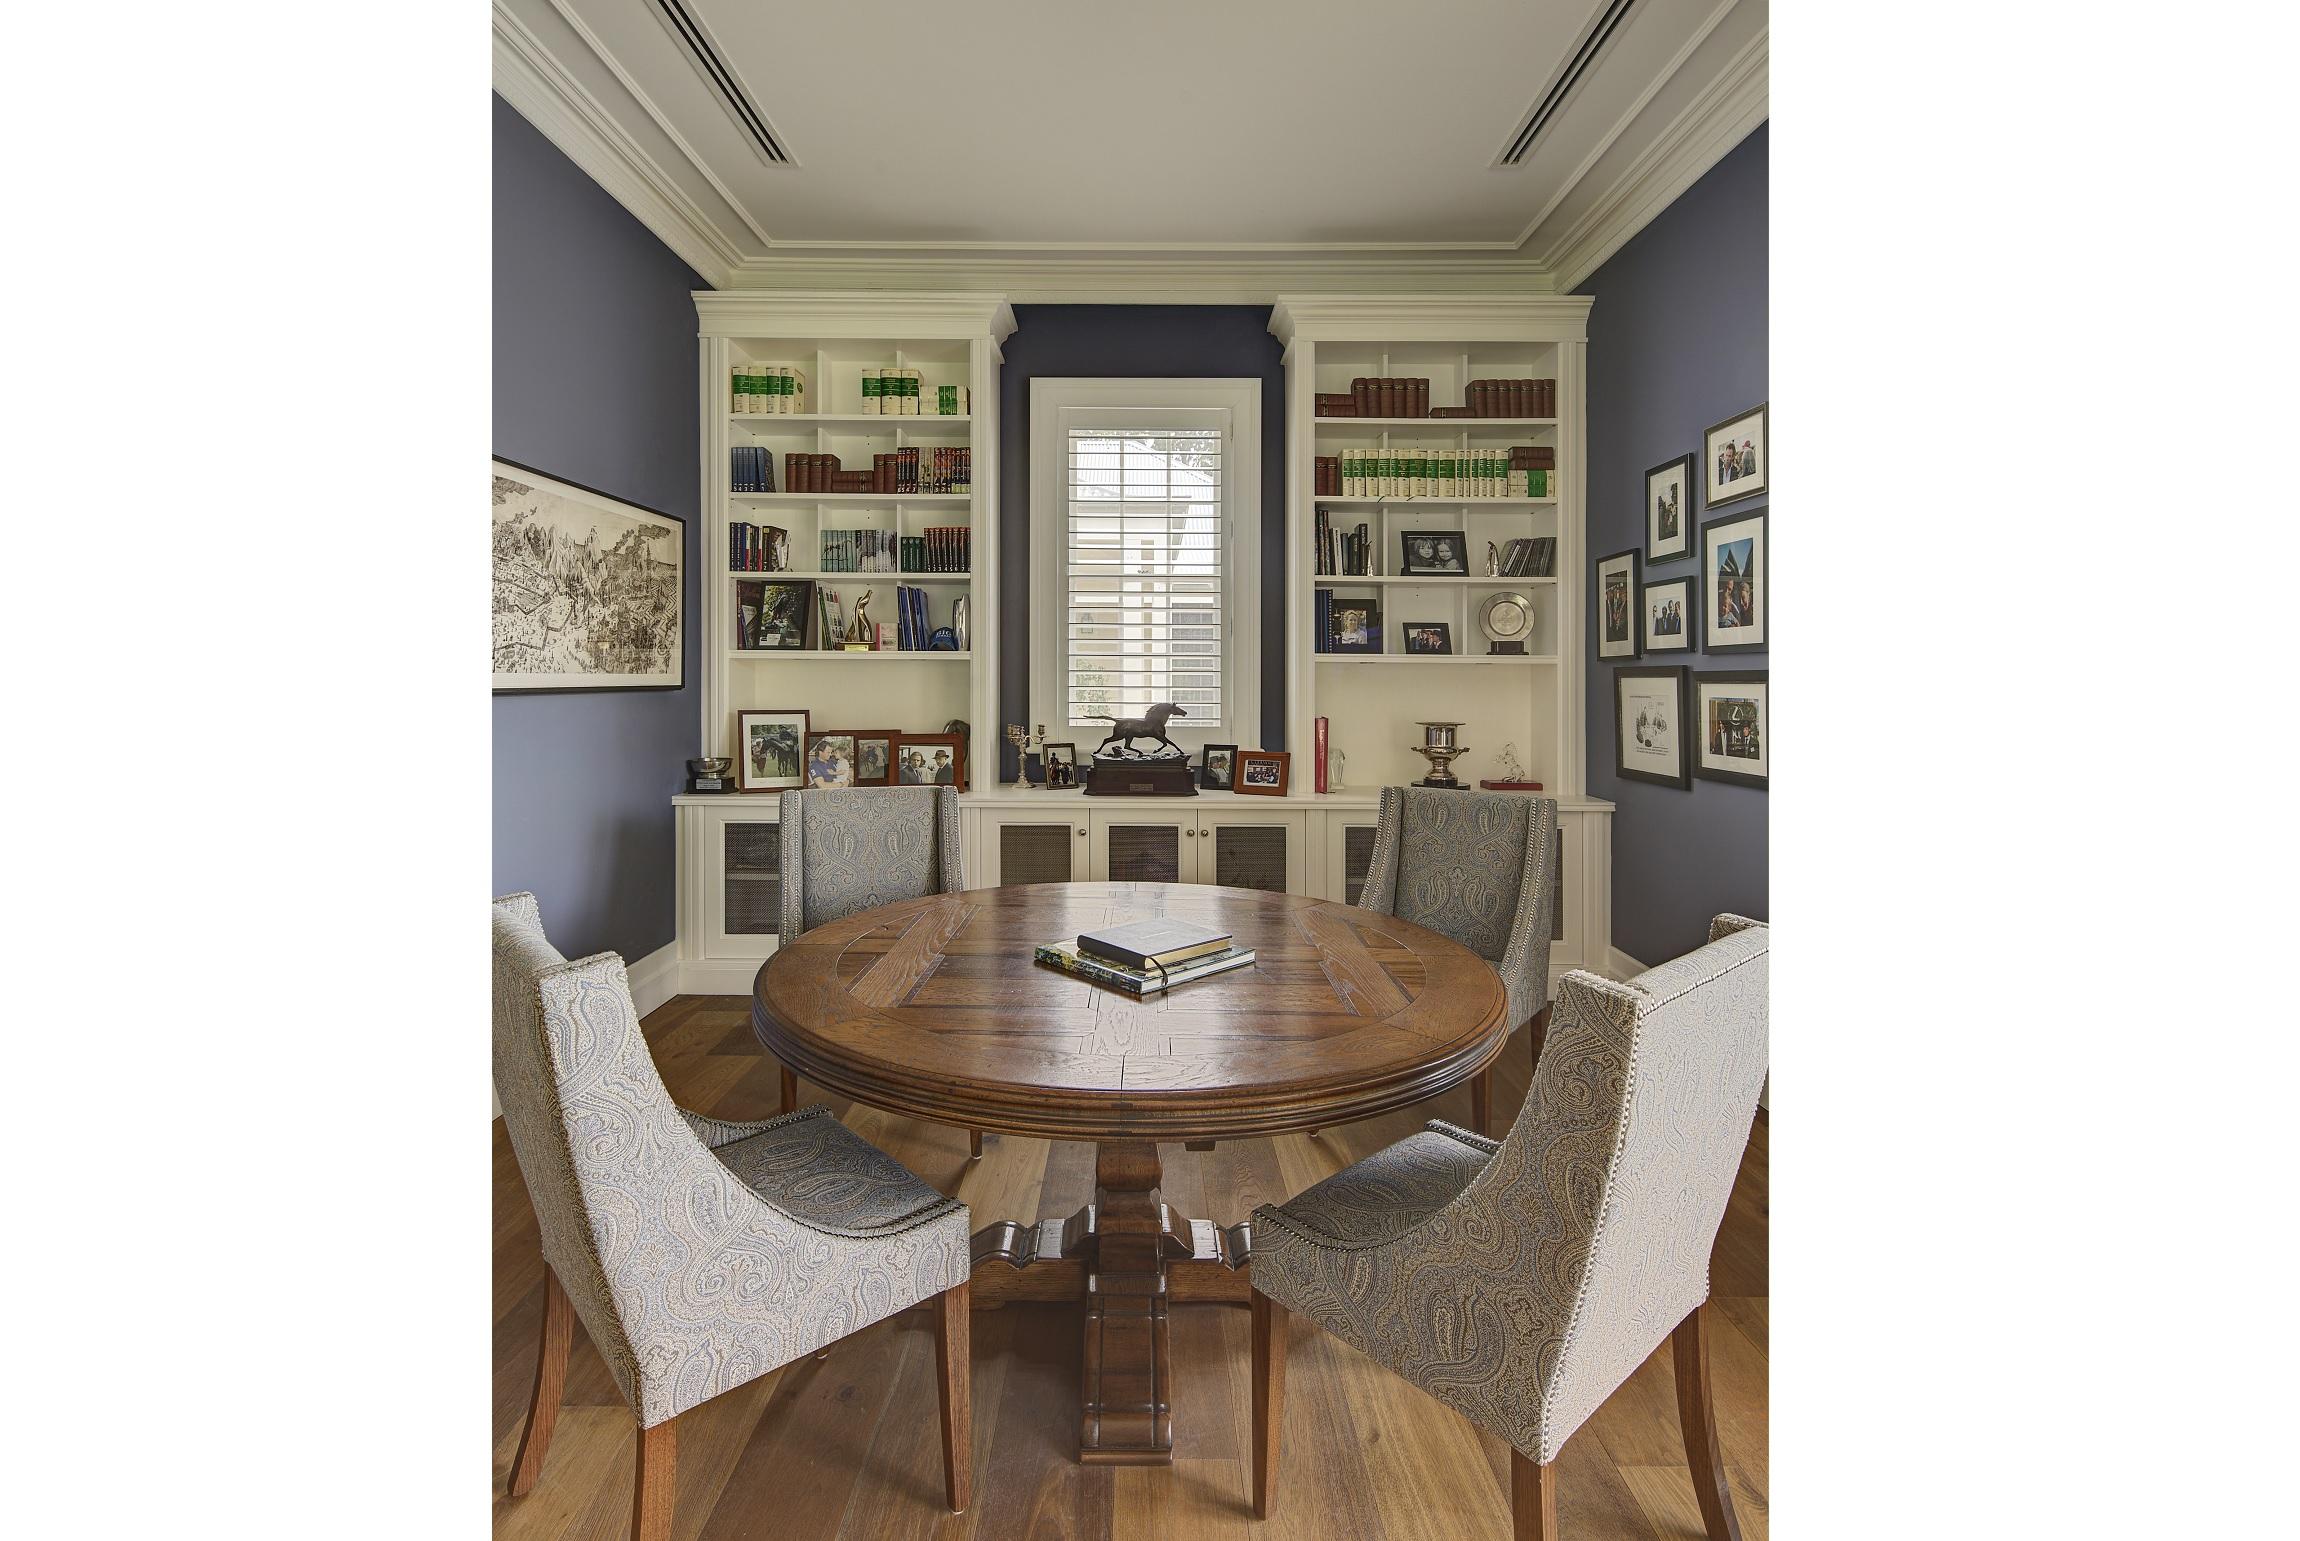 Horse-Stud-Office-Table-Interior-Decor-Hunter-Valley-Michael-Bell-Architects-Sydney